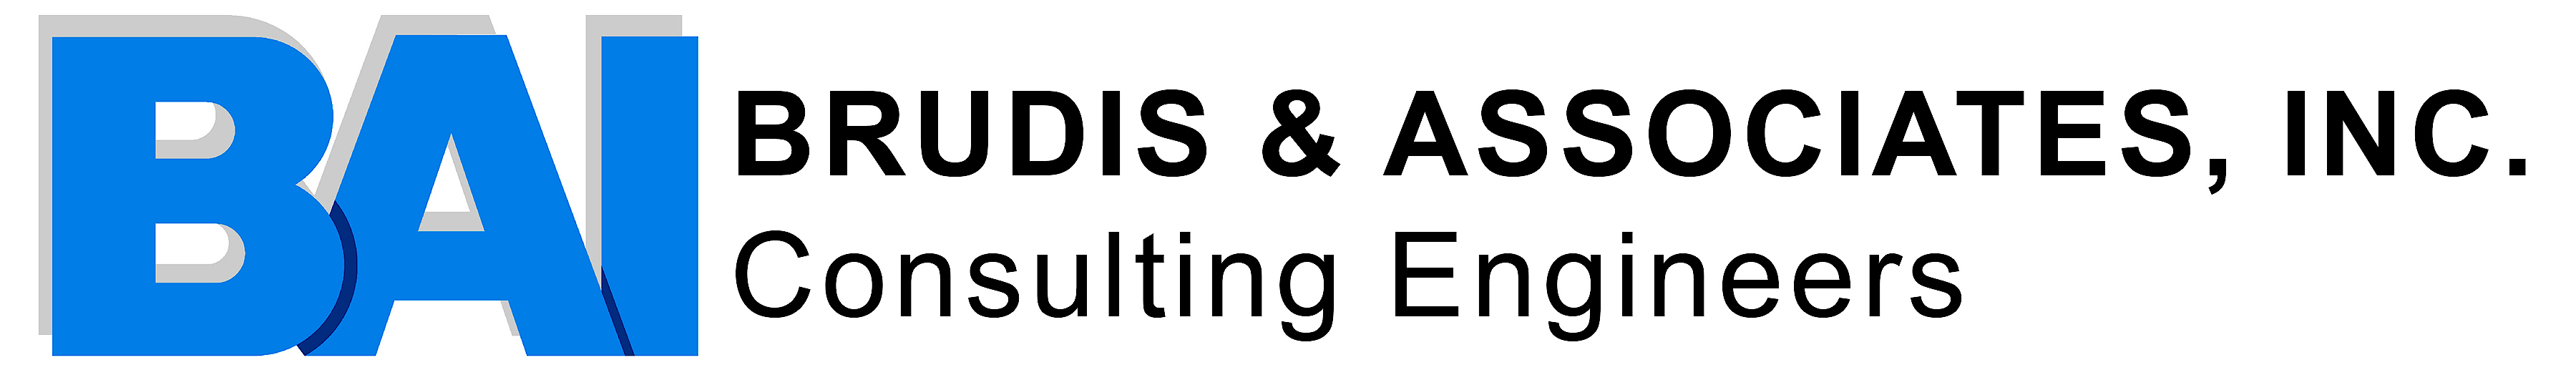 Brudis & Associates, Inc.